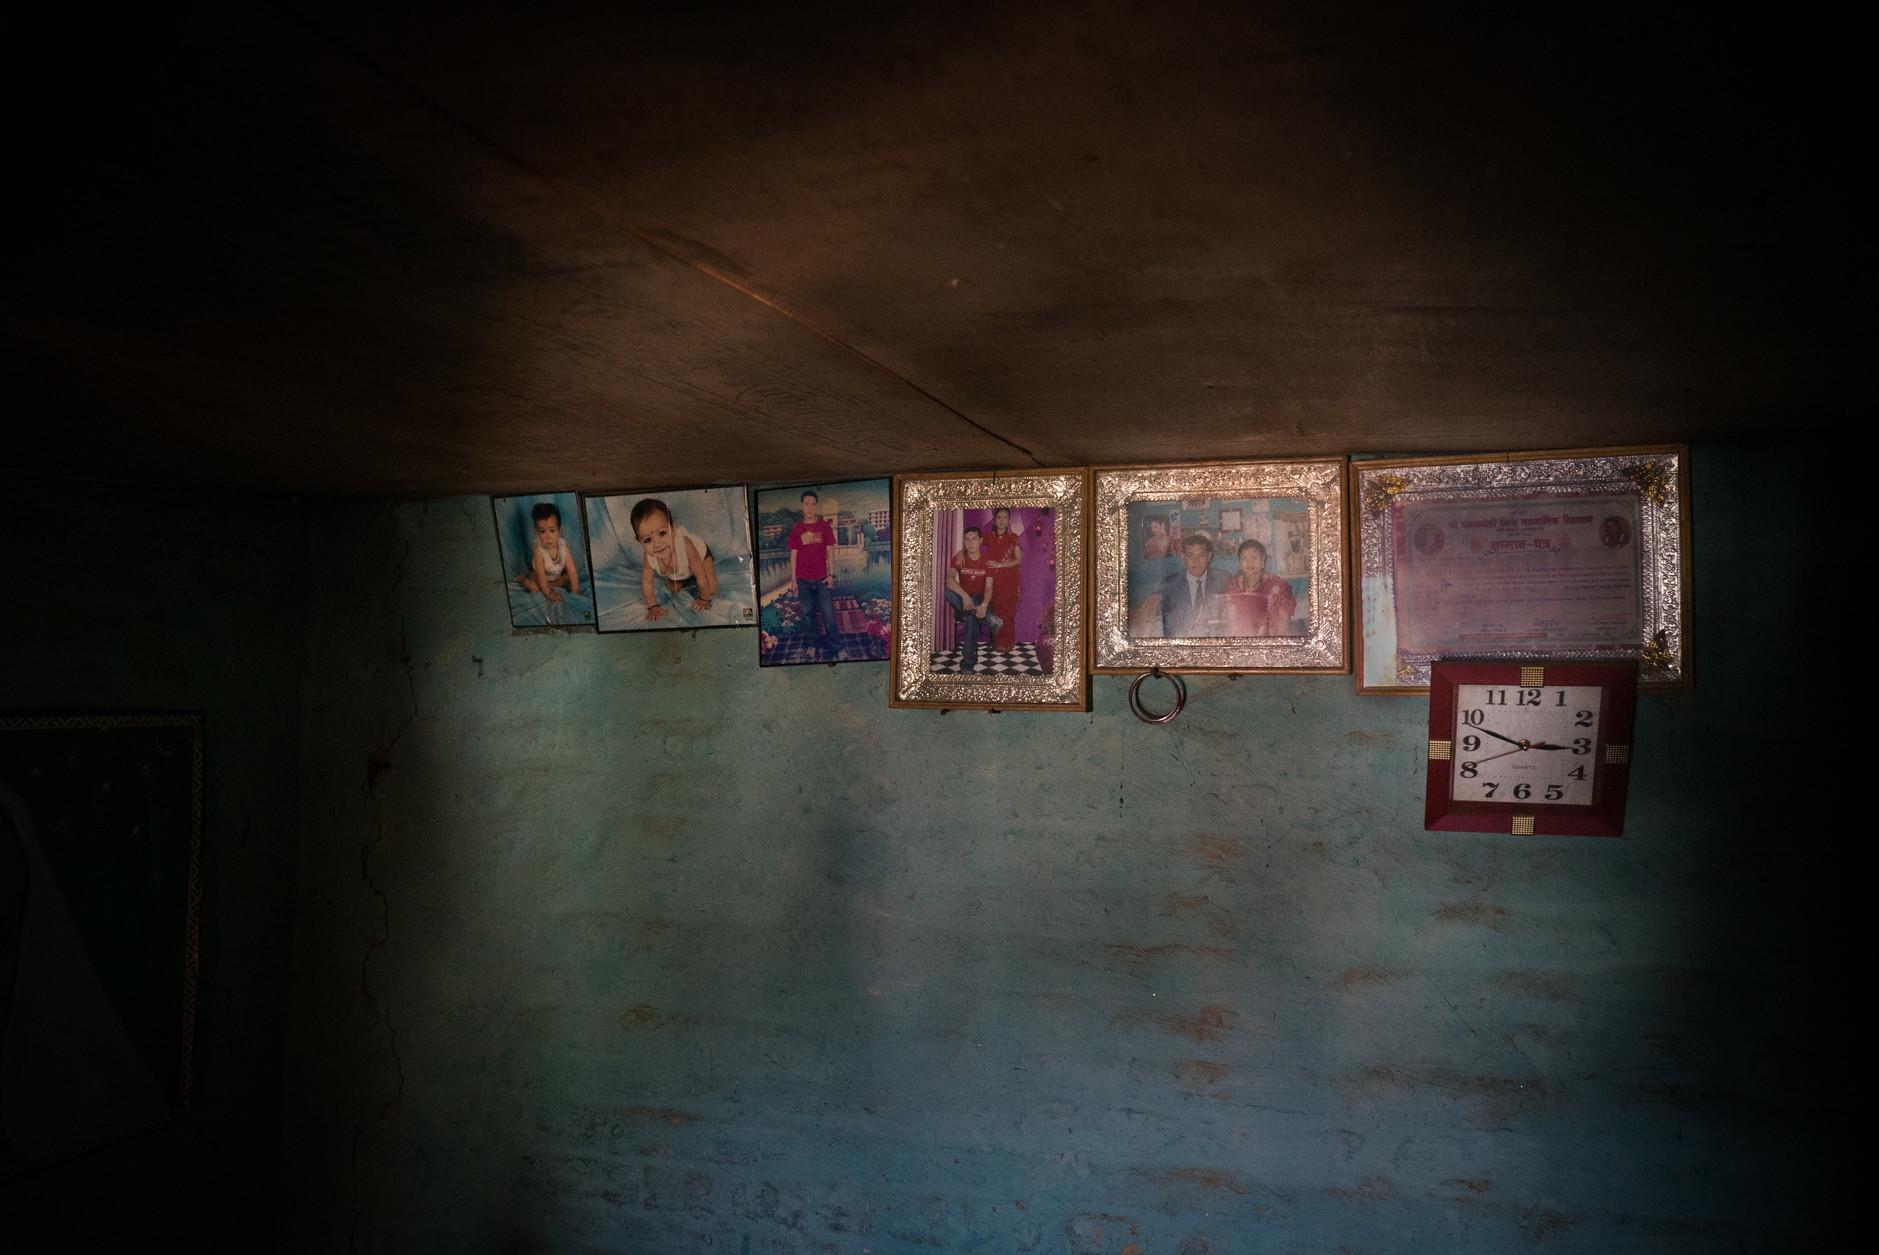 Shweta Gulati – Visual Storytelling Fellow Nepal